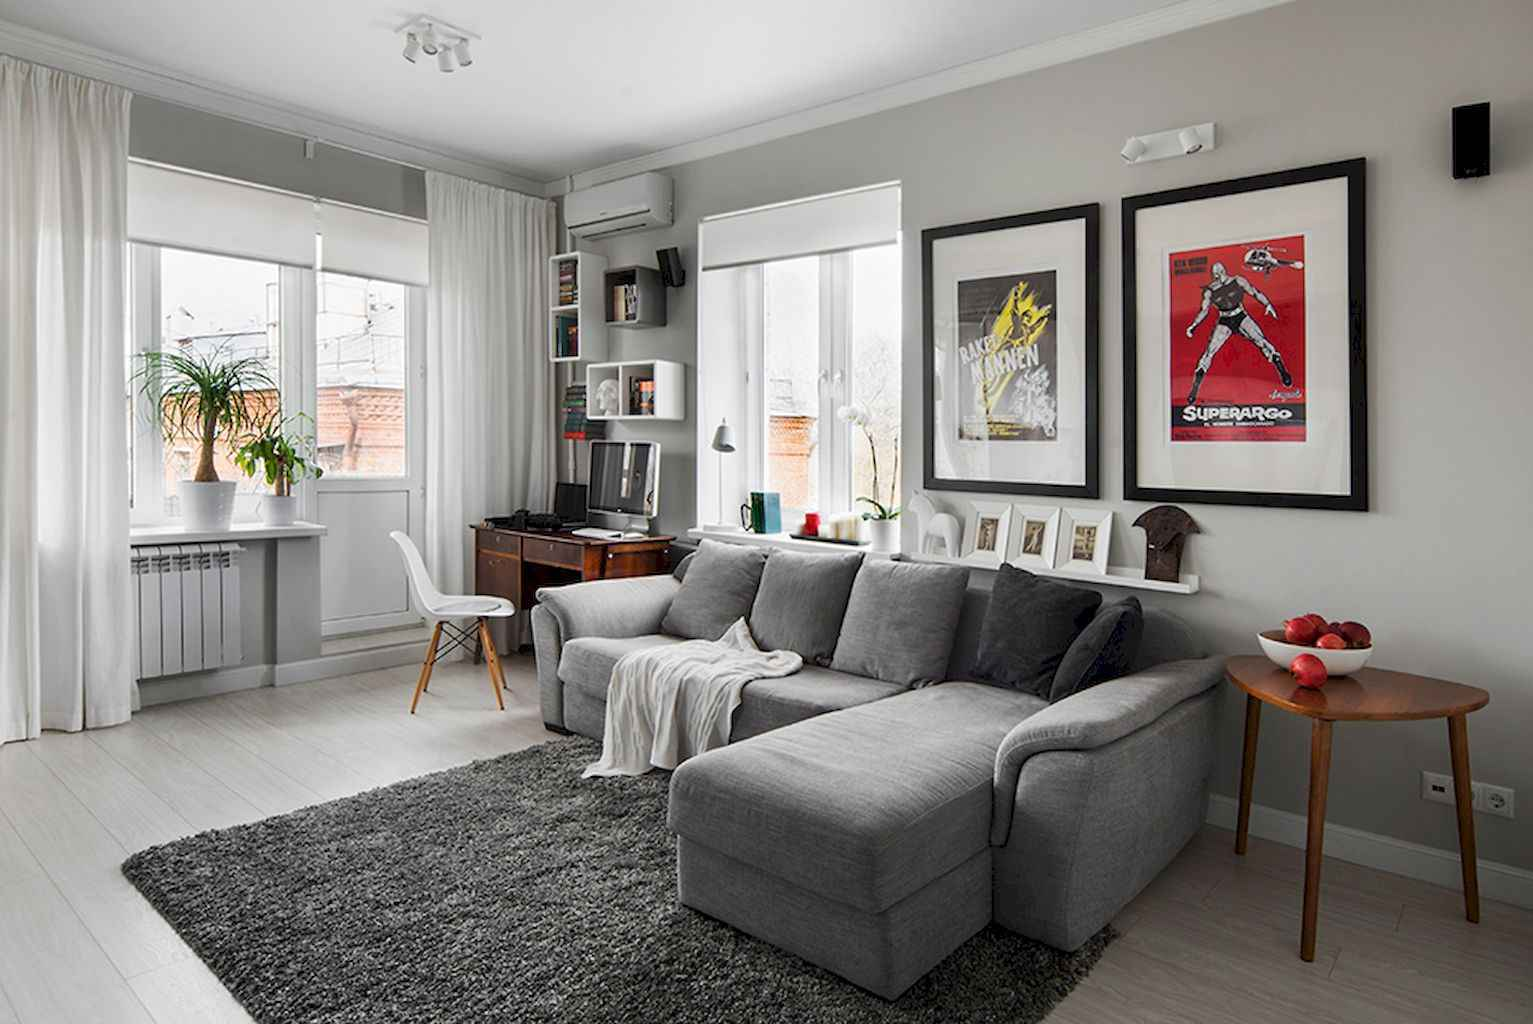 80 Elegant Harmony Interior Design Ideas For First Couple (62)